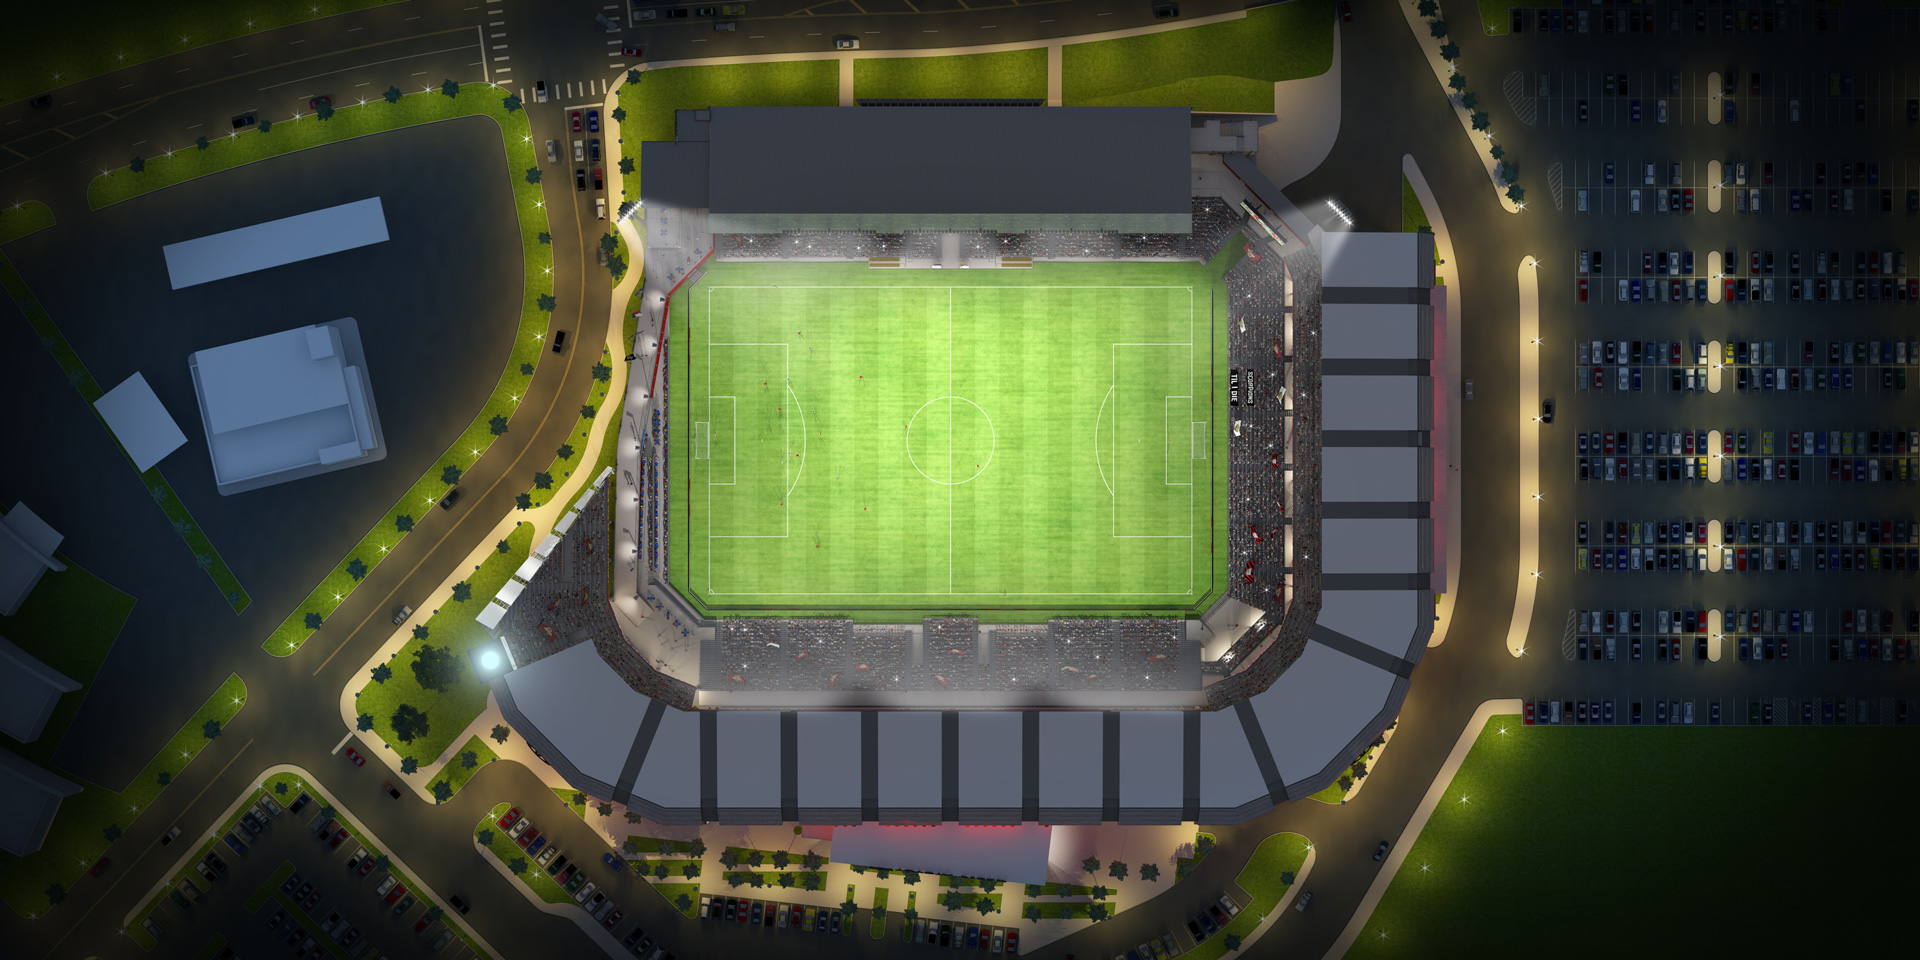 Toyota Field 3D Illustration Rendering